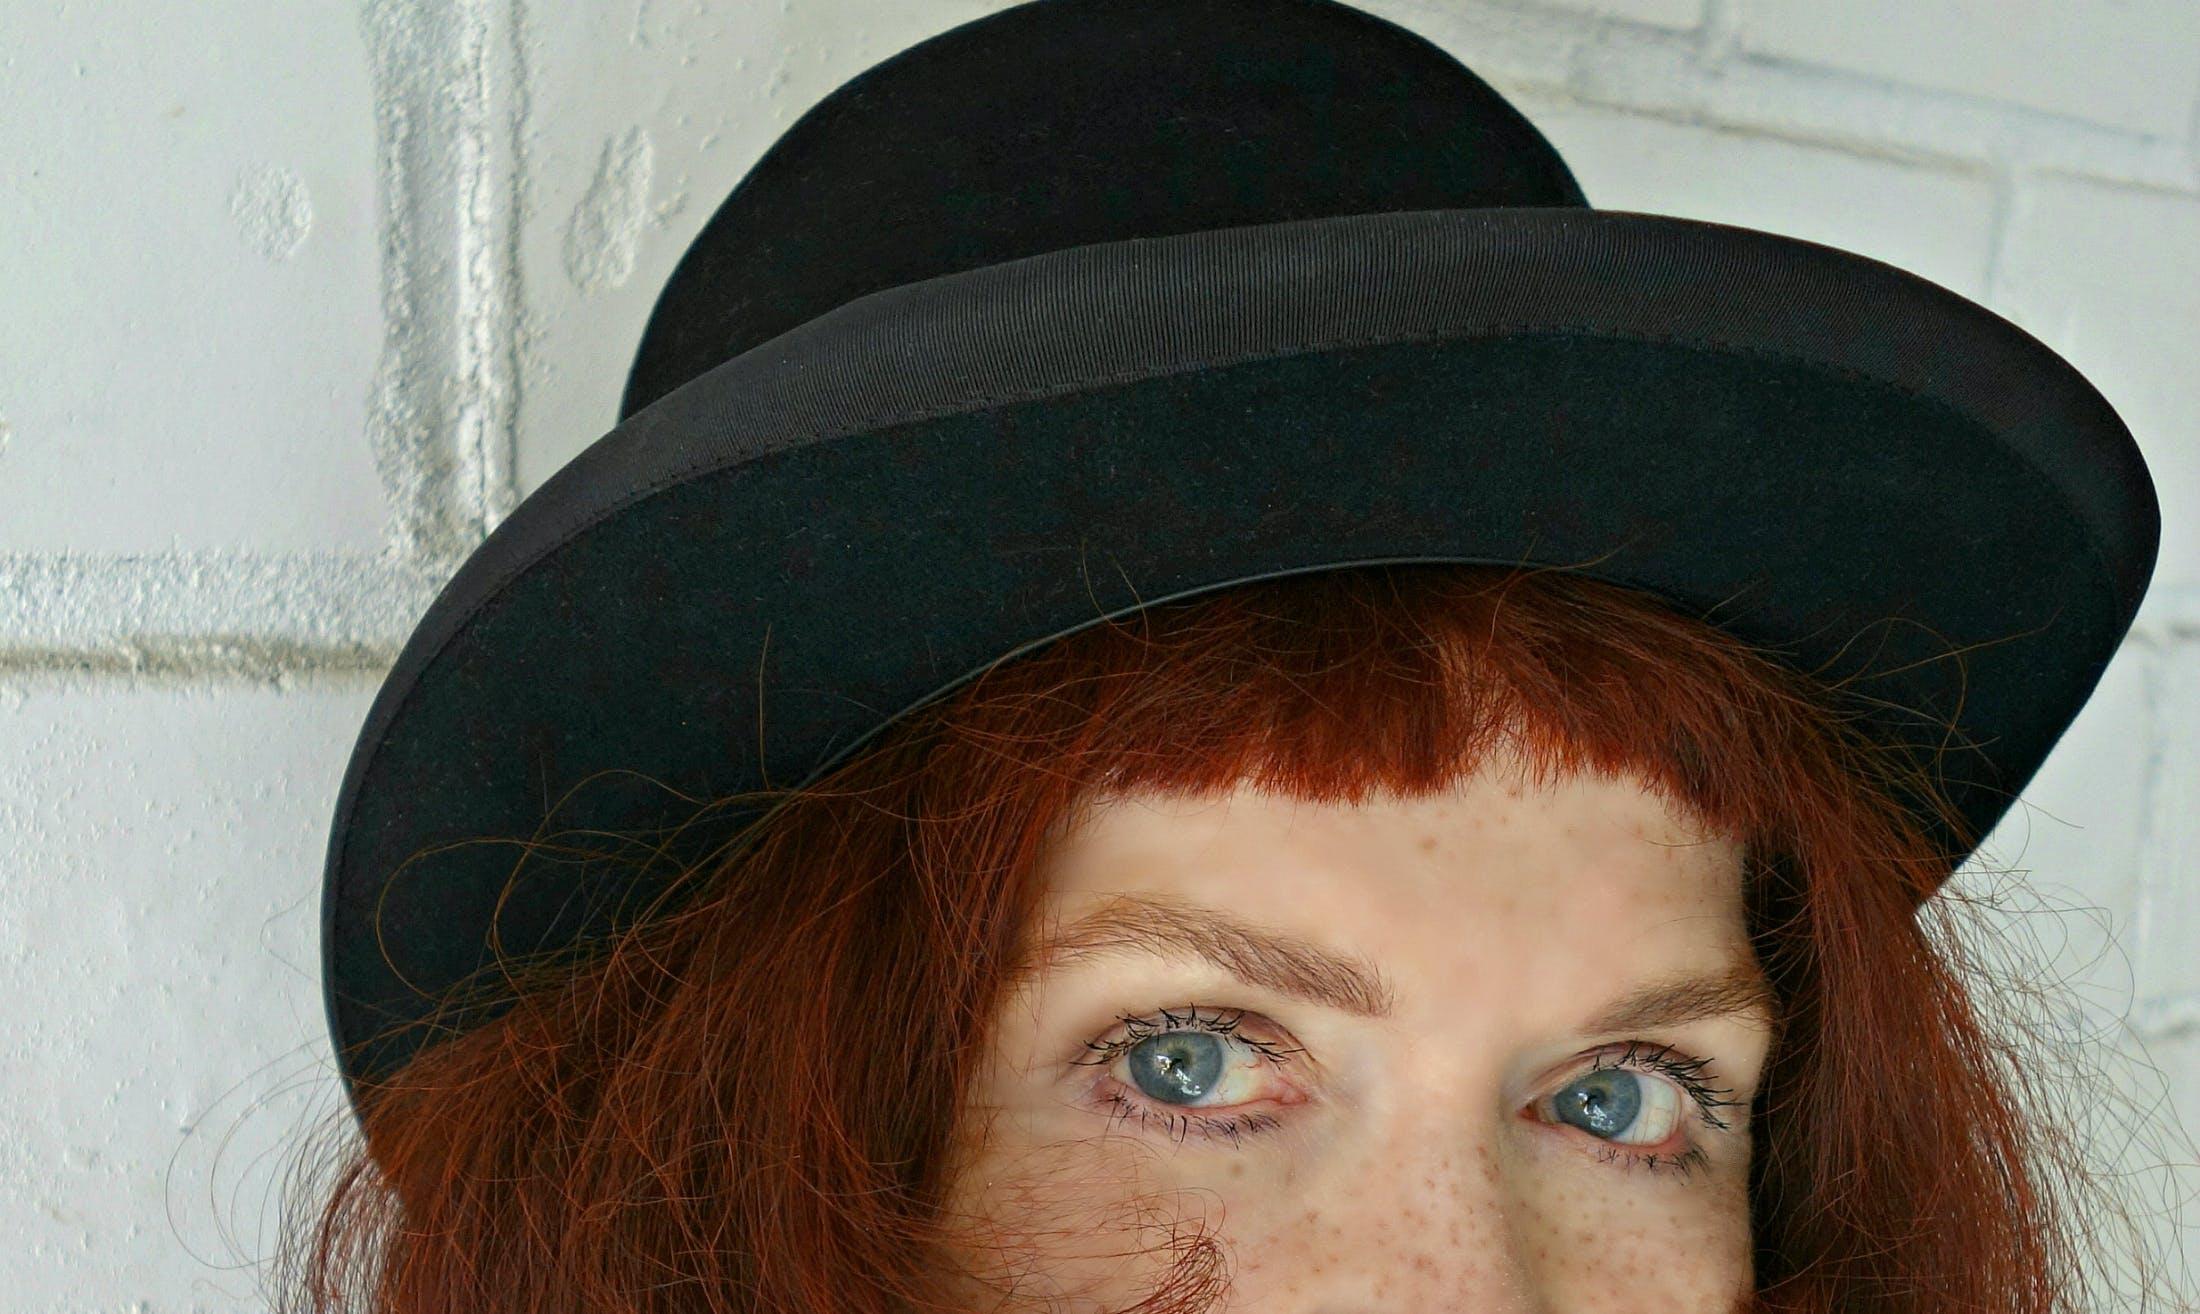 Free stock photo of eyes, hat, white, head